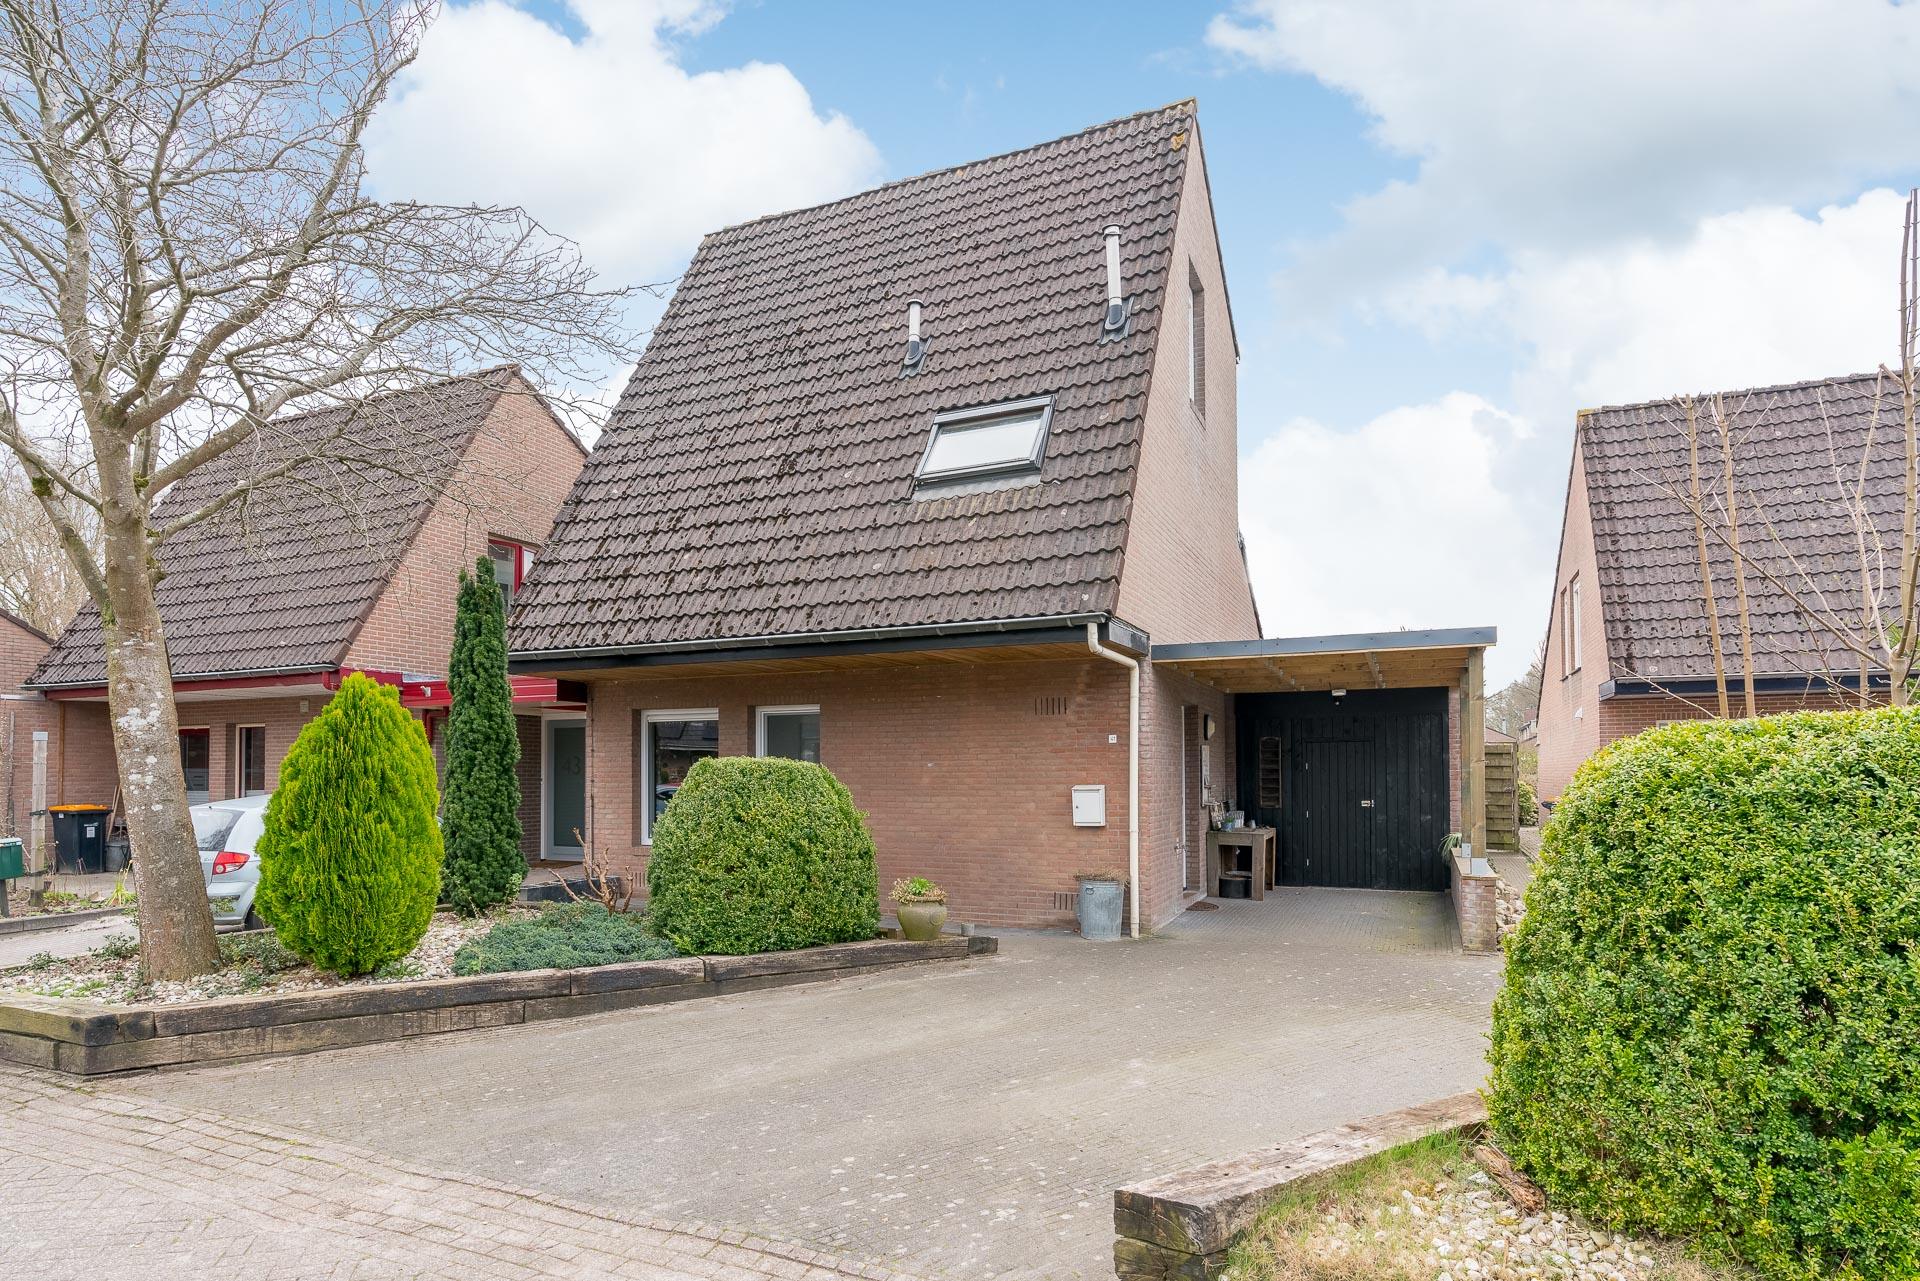 Boerkamp 41,Westerbork,Drenthe,1975 ,slaapkamers,5 Badkamer,,Woningen,Boerkamp.